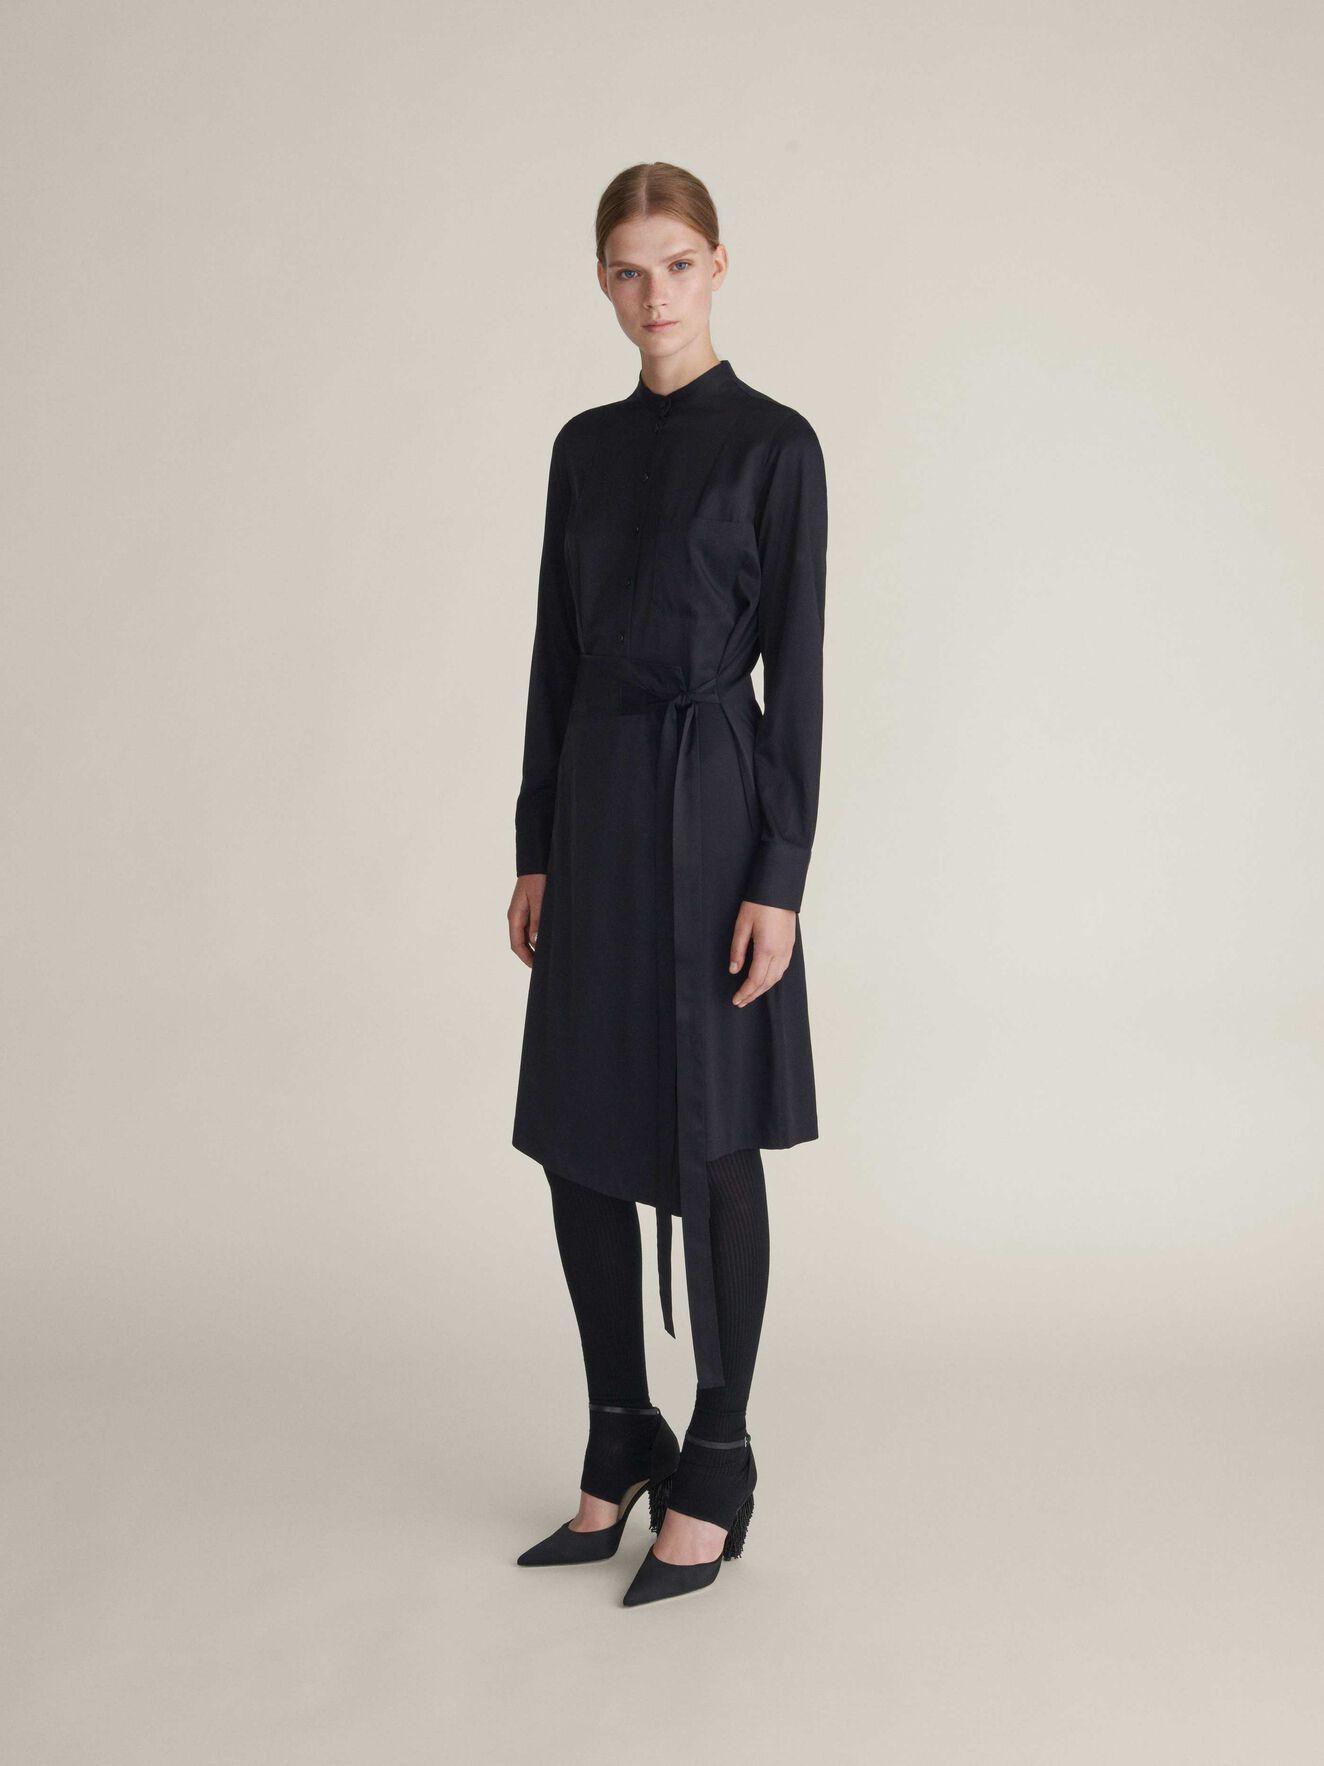 Leonetta Dress in Midnight Black from Tiger of Sweden